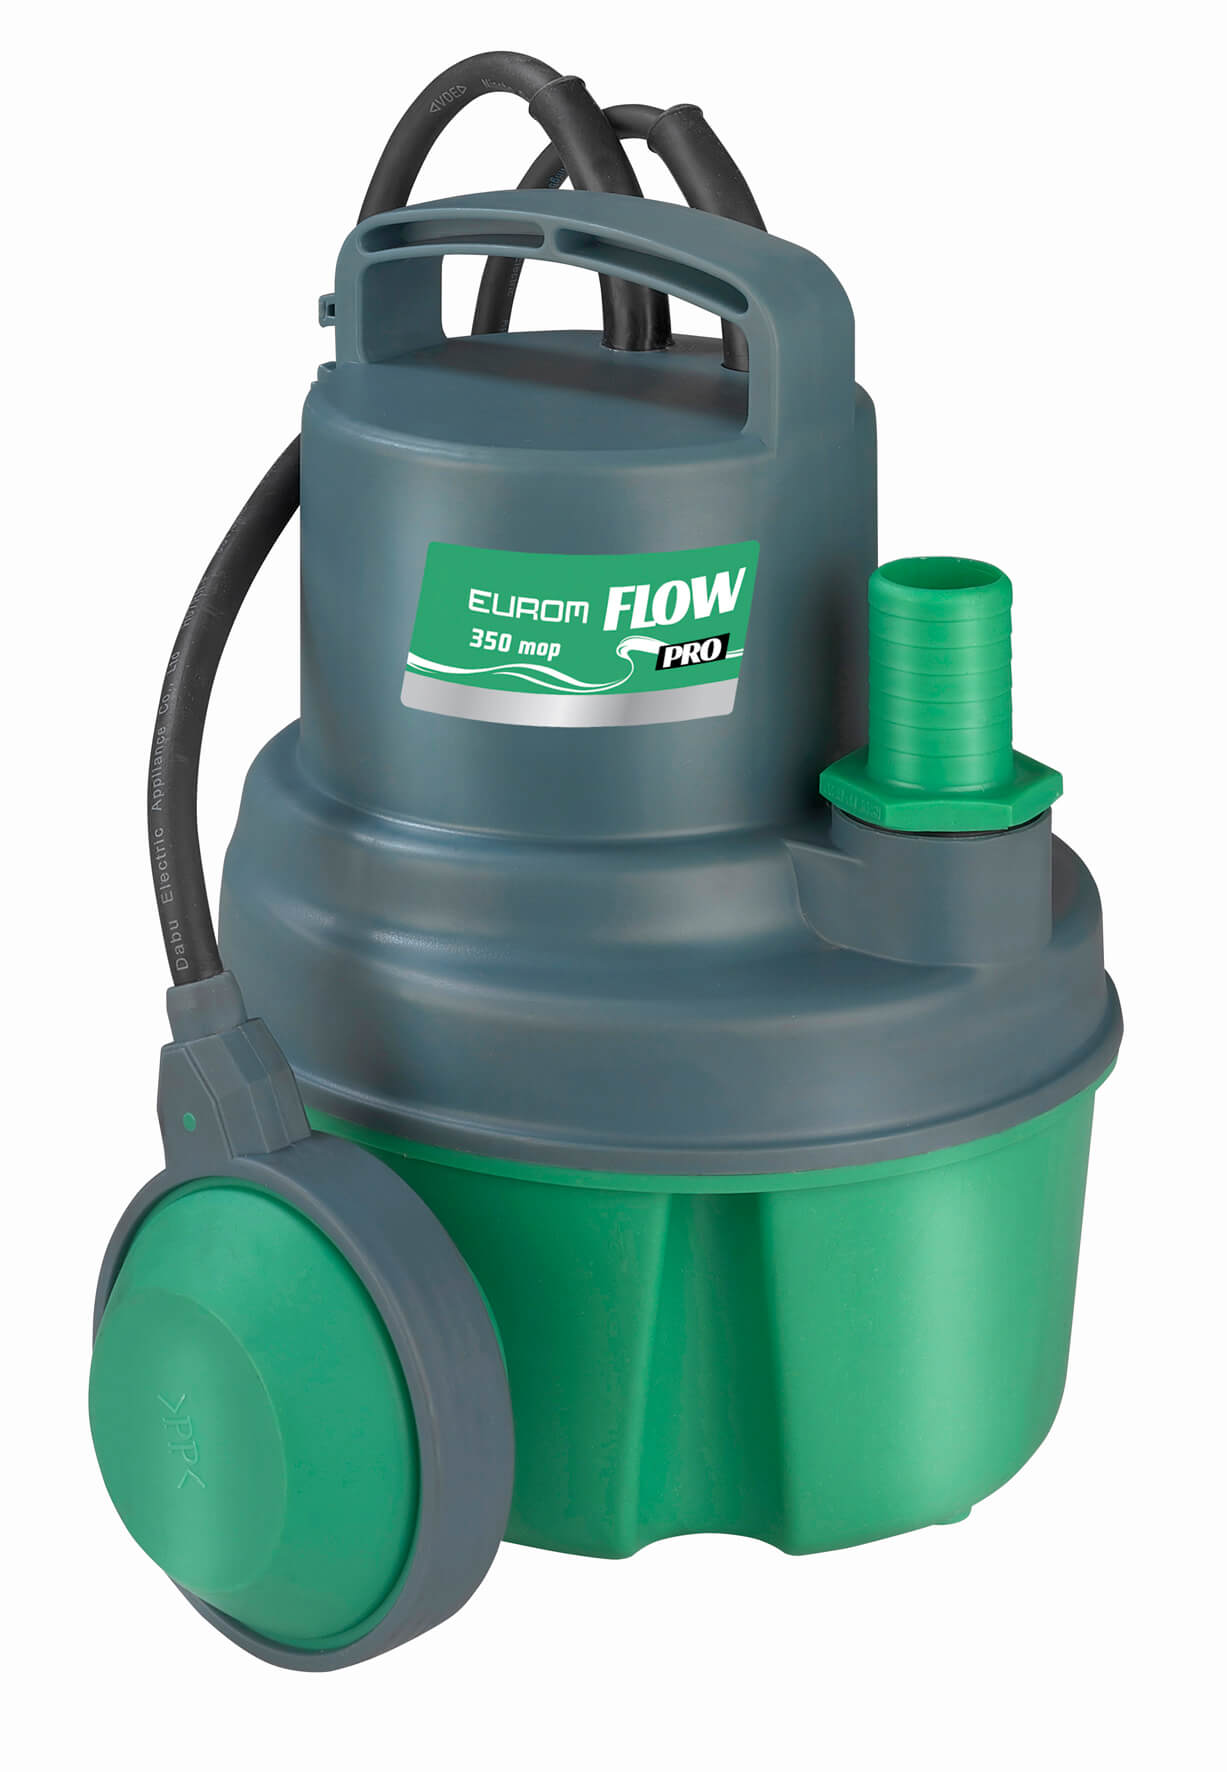 Eurom Flow Pro 350 mop schoonwaterpomp 350W   Dompelpomp   Dweilpomp